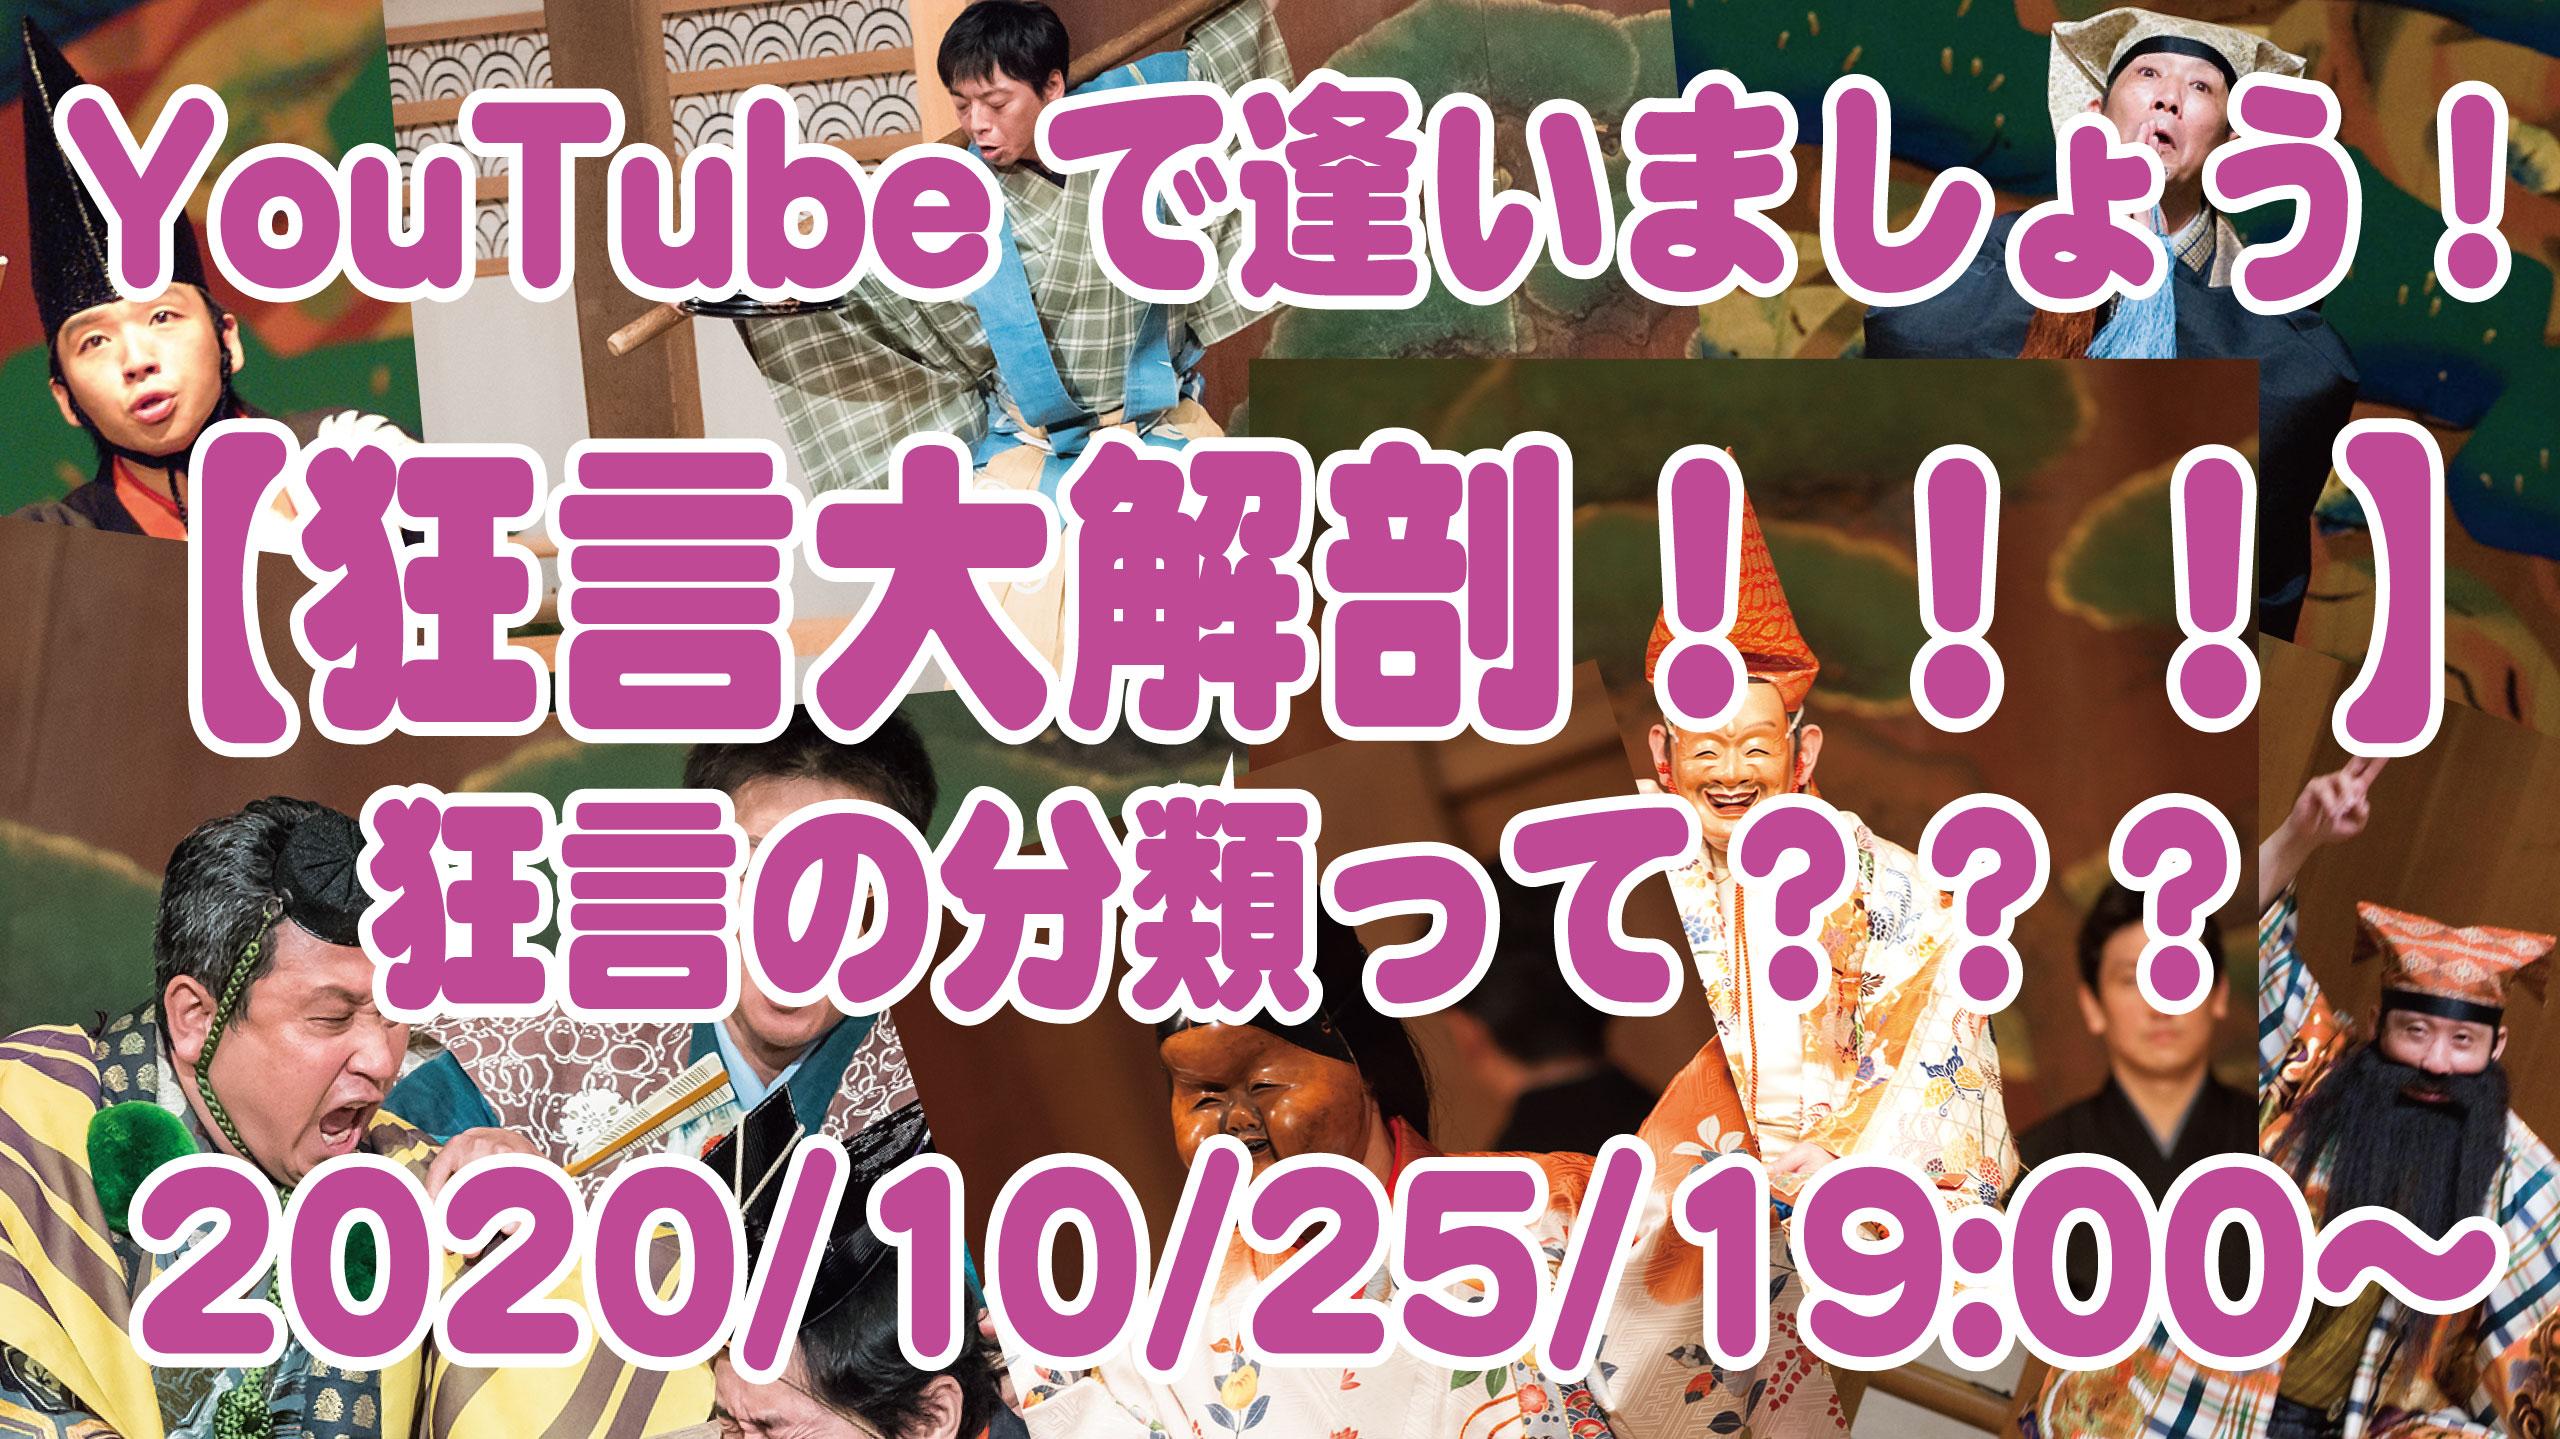 YouTubeで逢いましょう!ライブ配信は10/25(日)19:00〜!